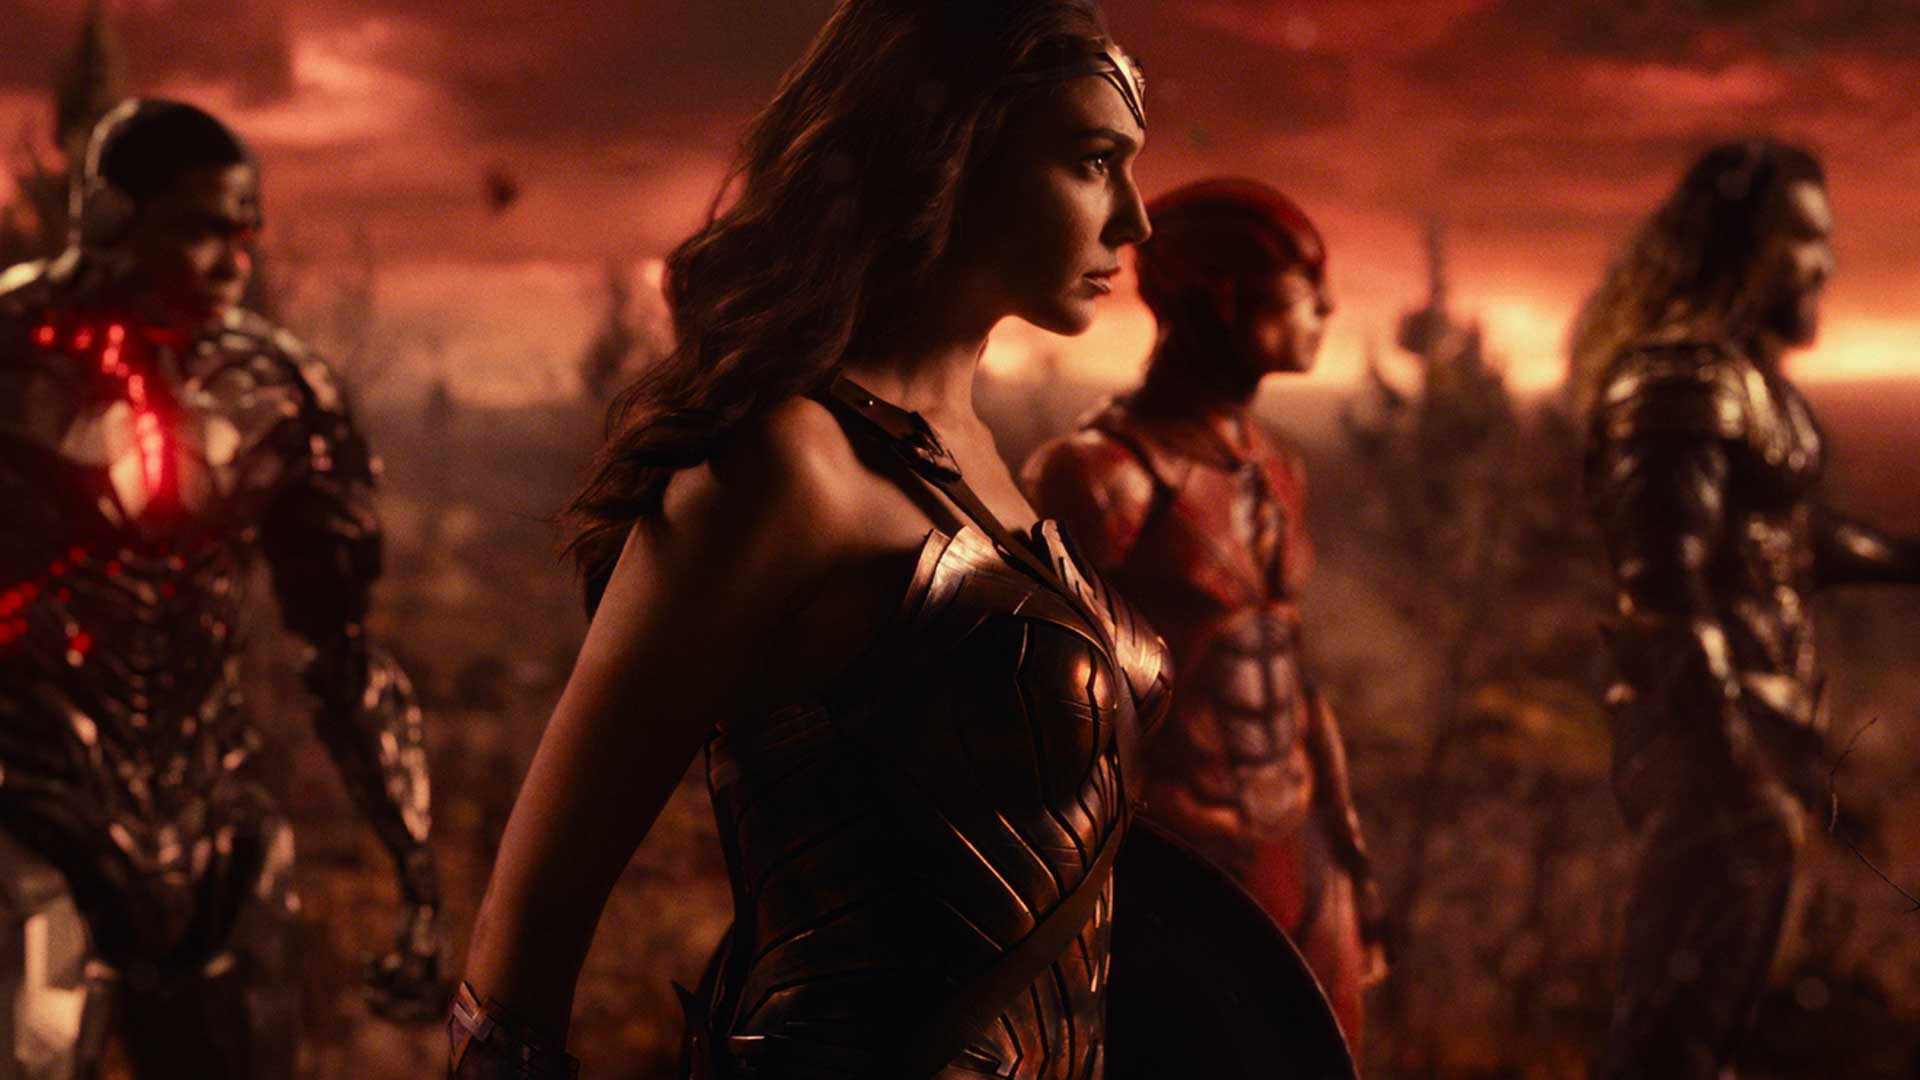 #67) Justice League(-8) - (2017 - dir. Zack Snyder)